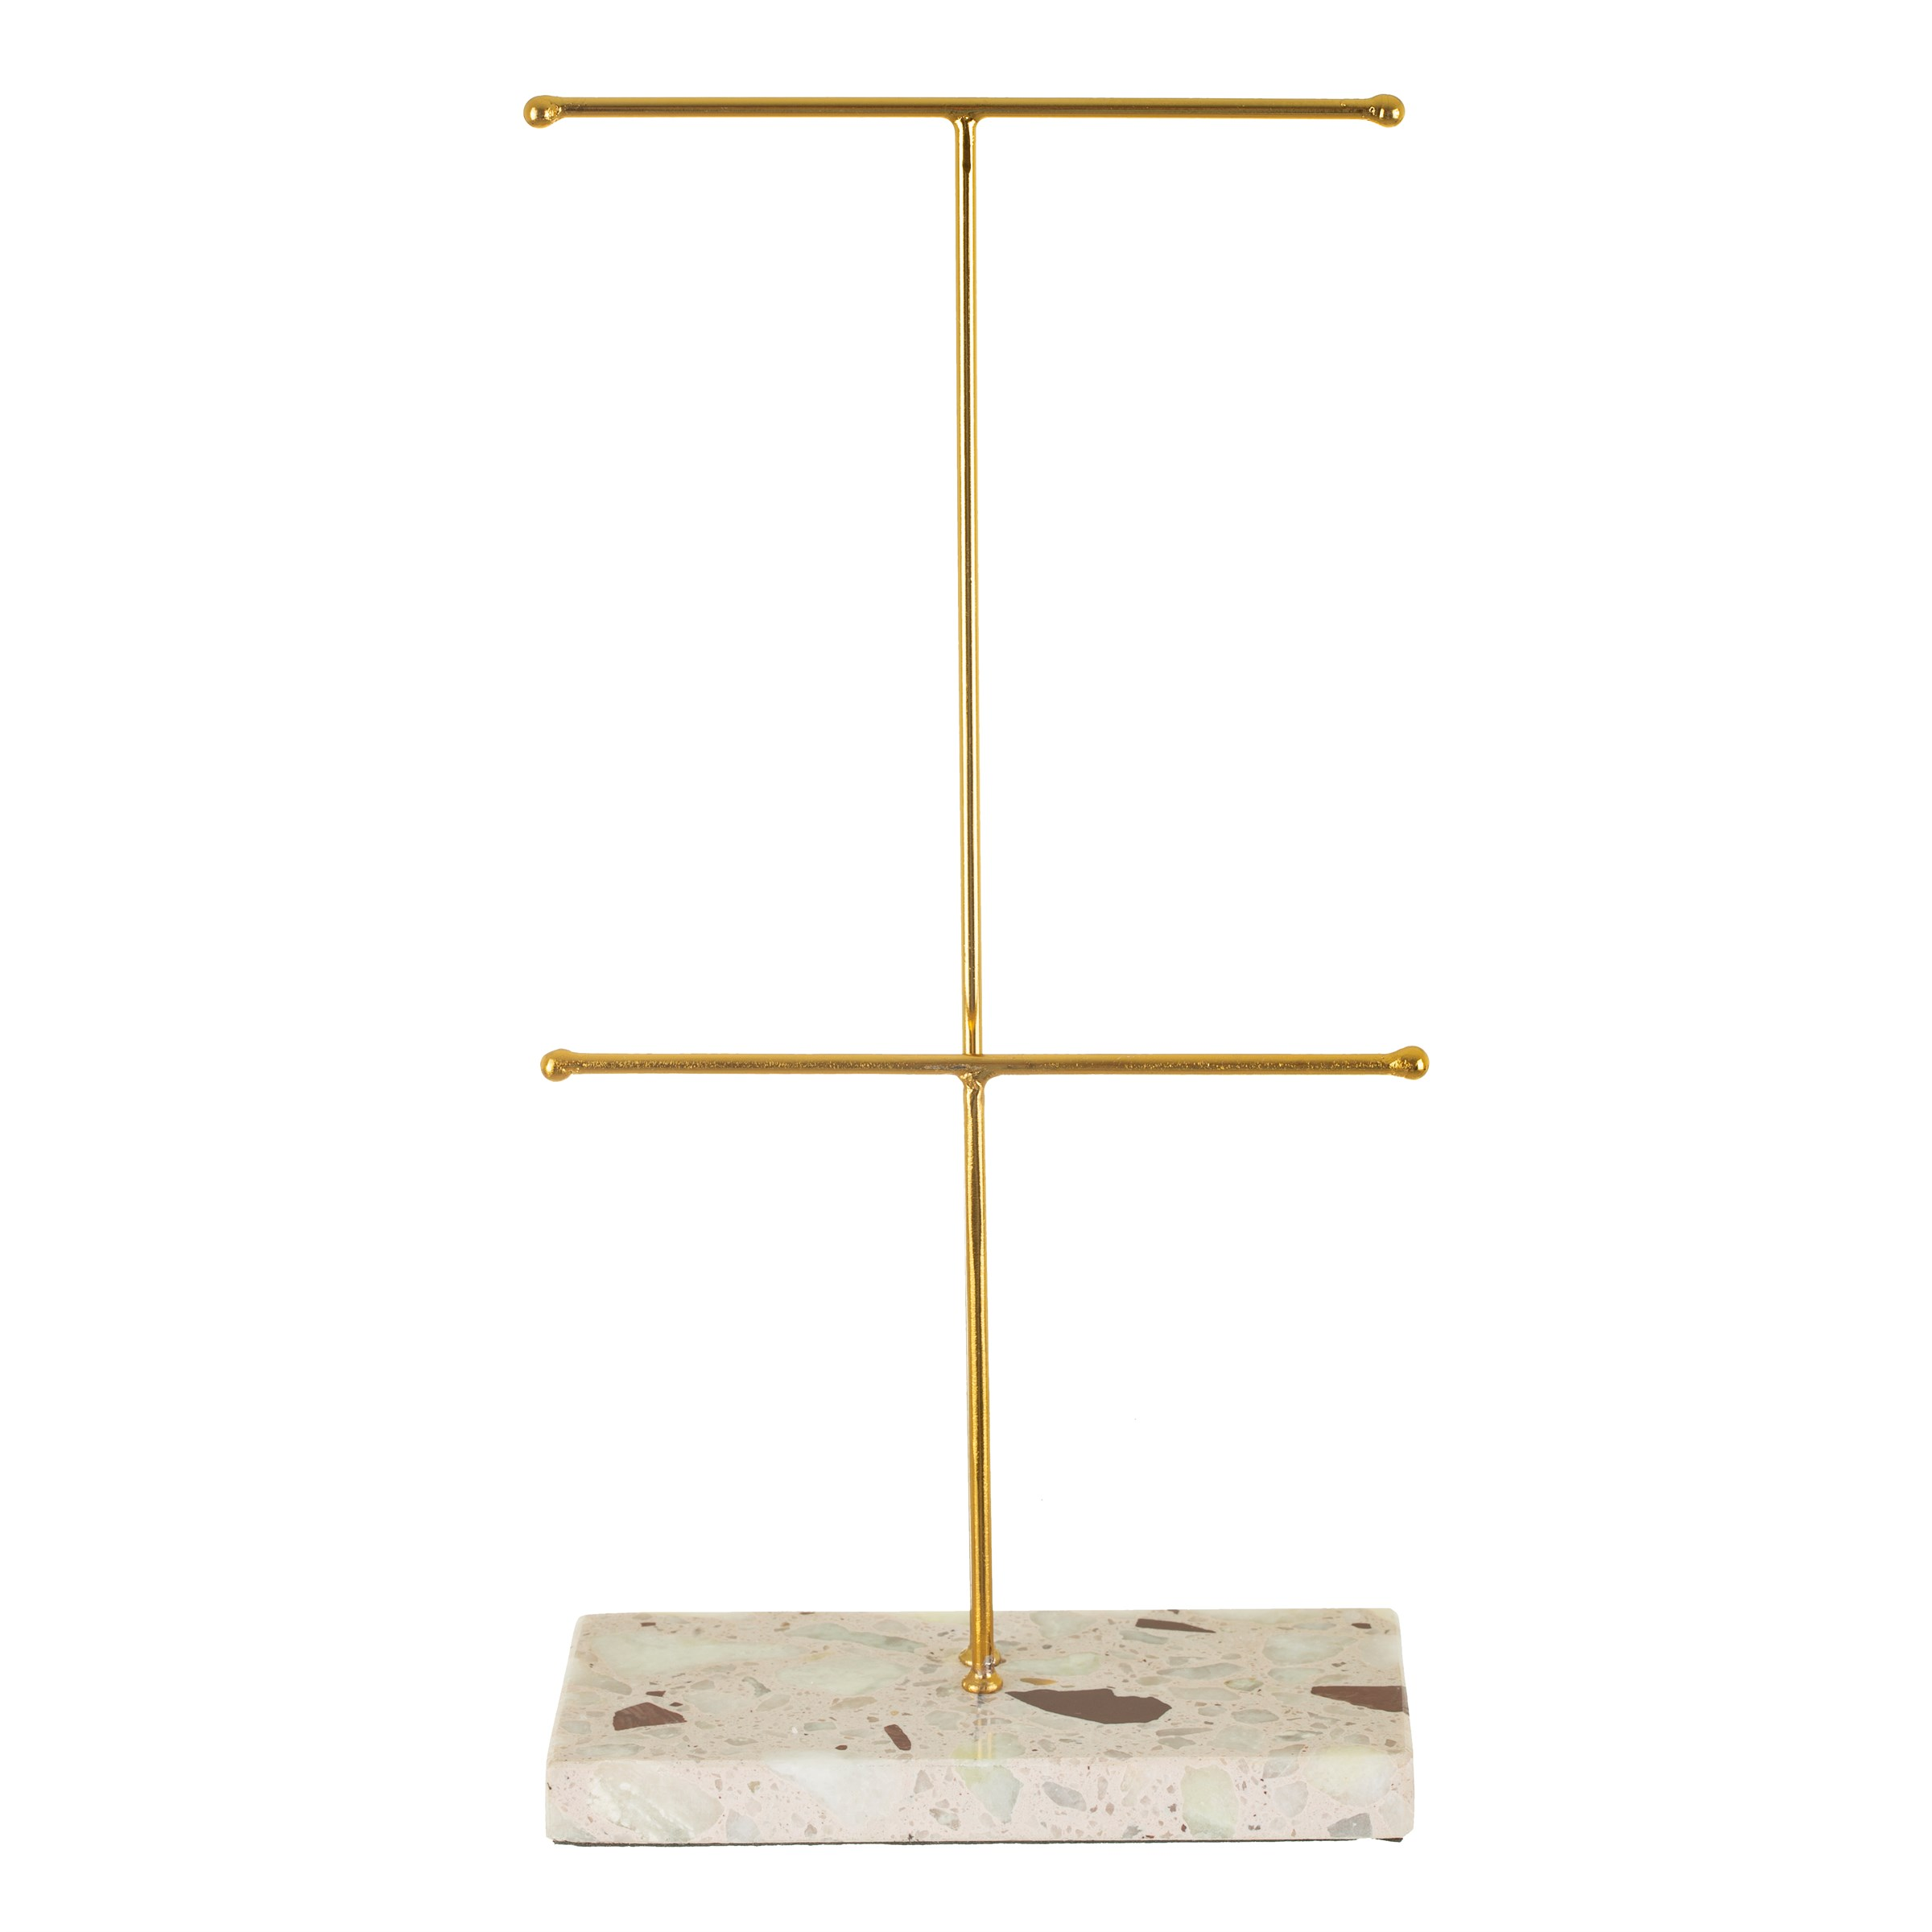 Double Terrazzo Gold Jewellery Stand